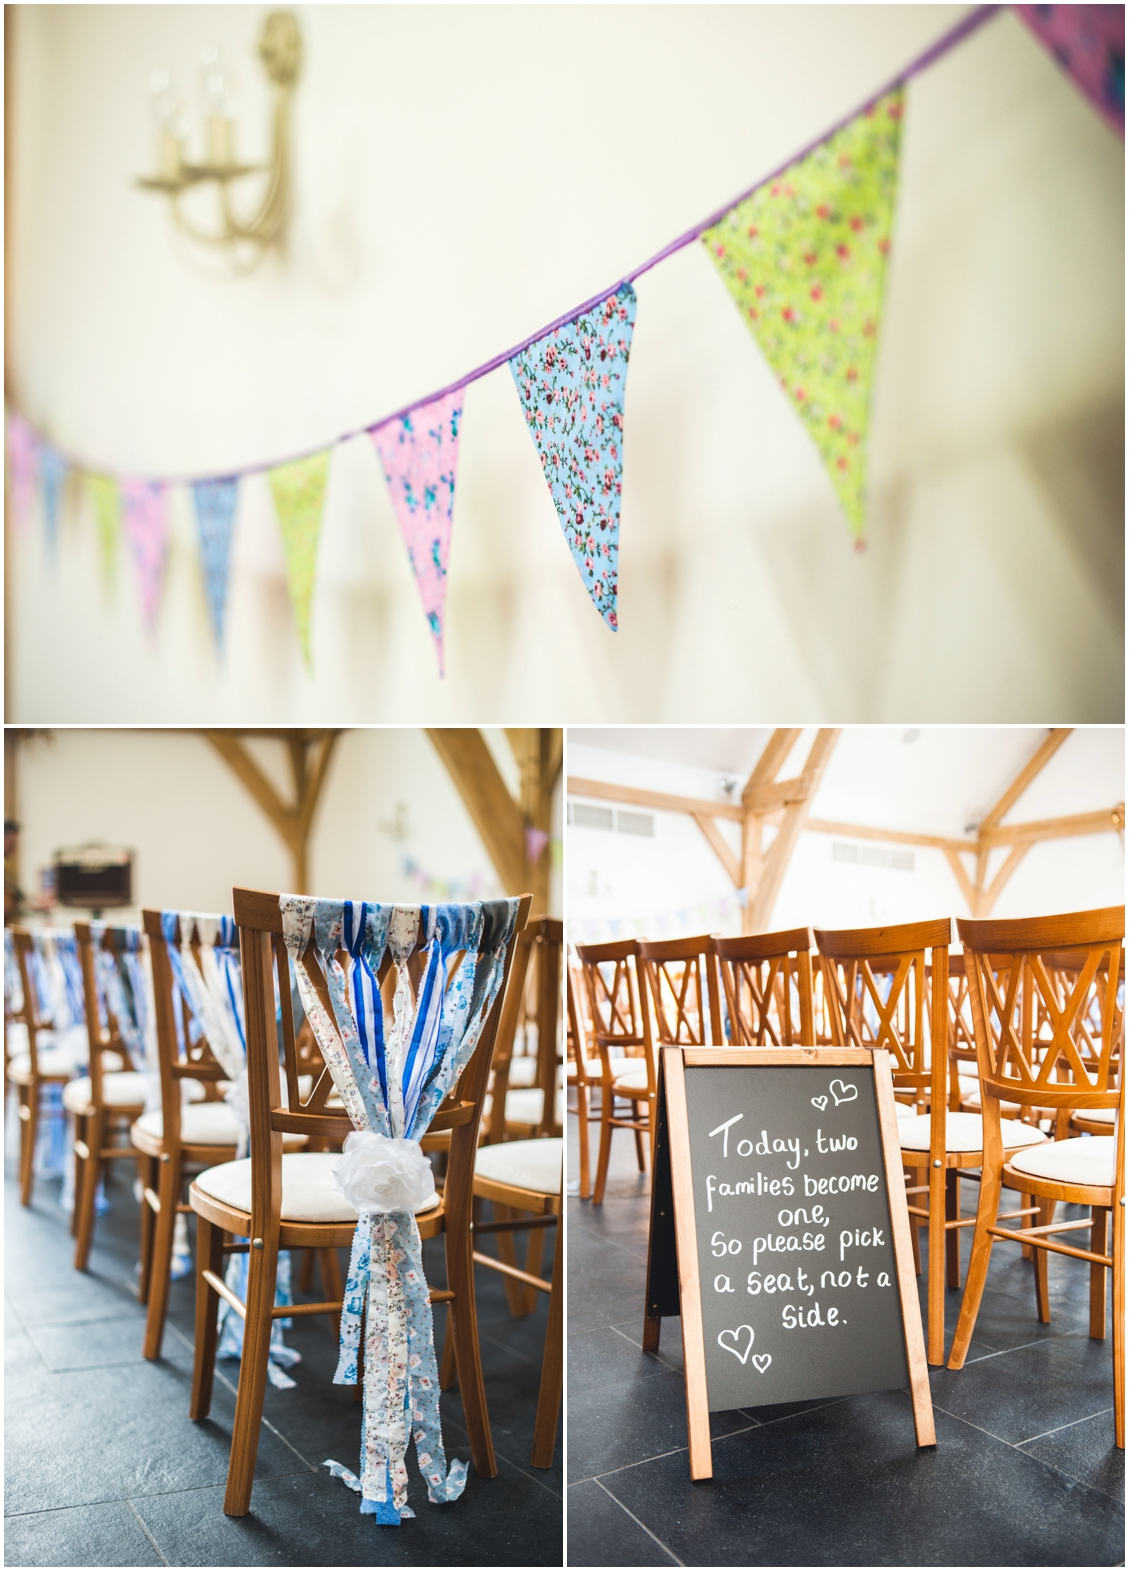 holly and tim, wedding photography, mythe barn, west midlands, Lisa Carpenter Photography, photos, birmingham